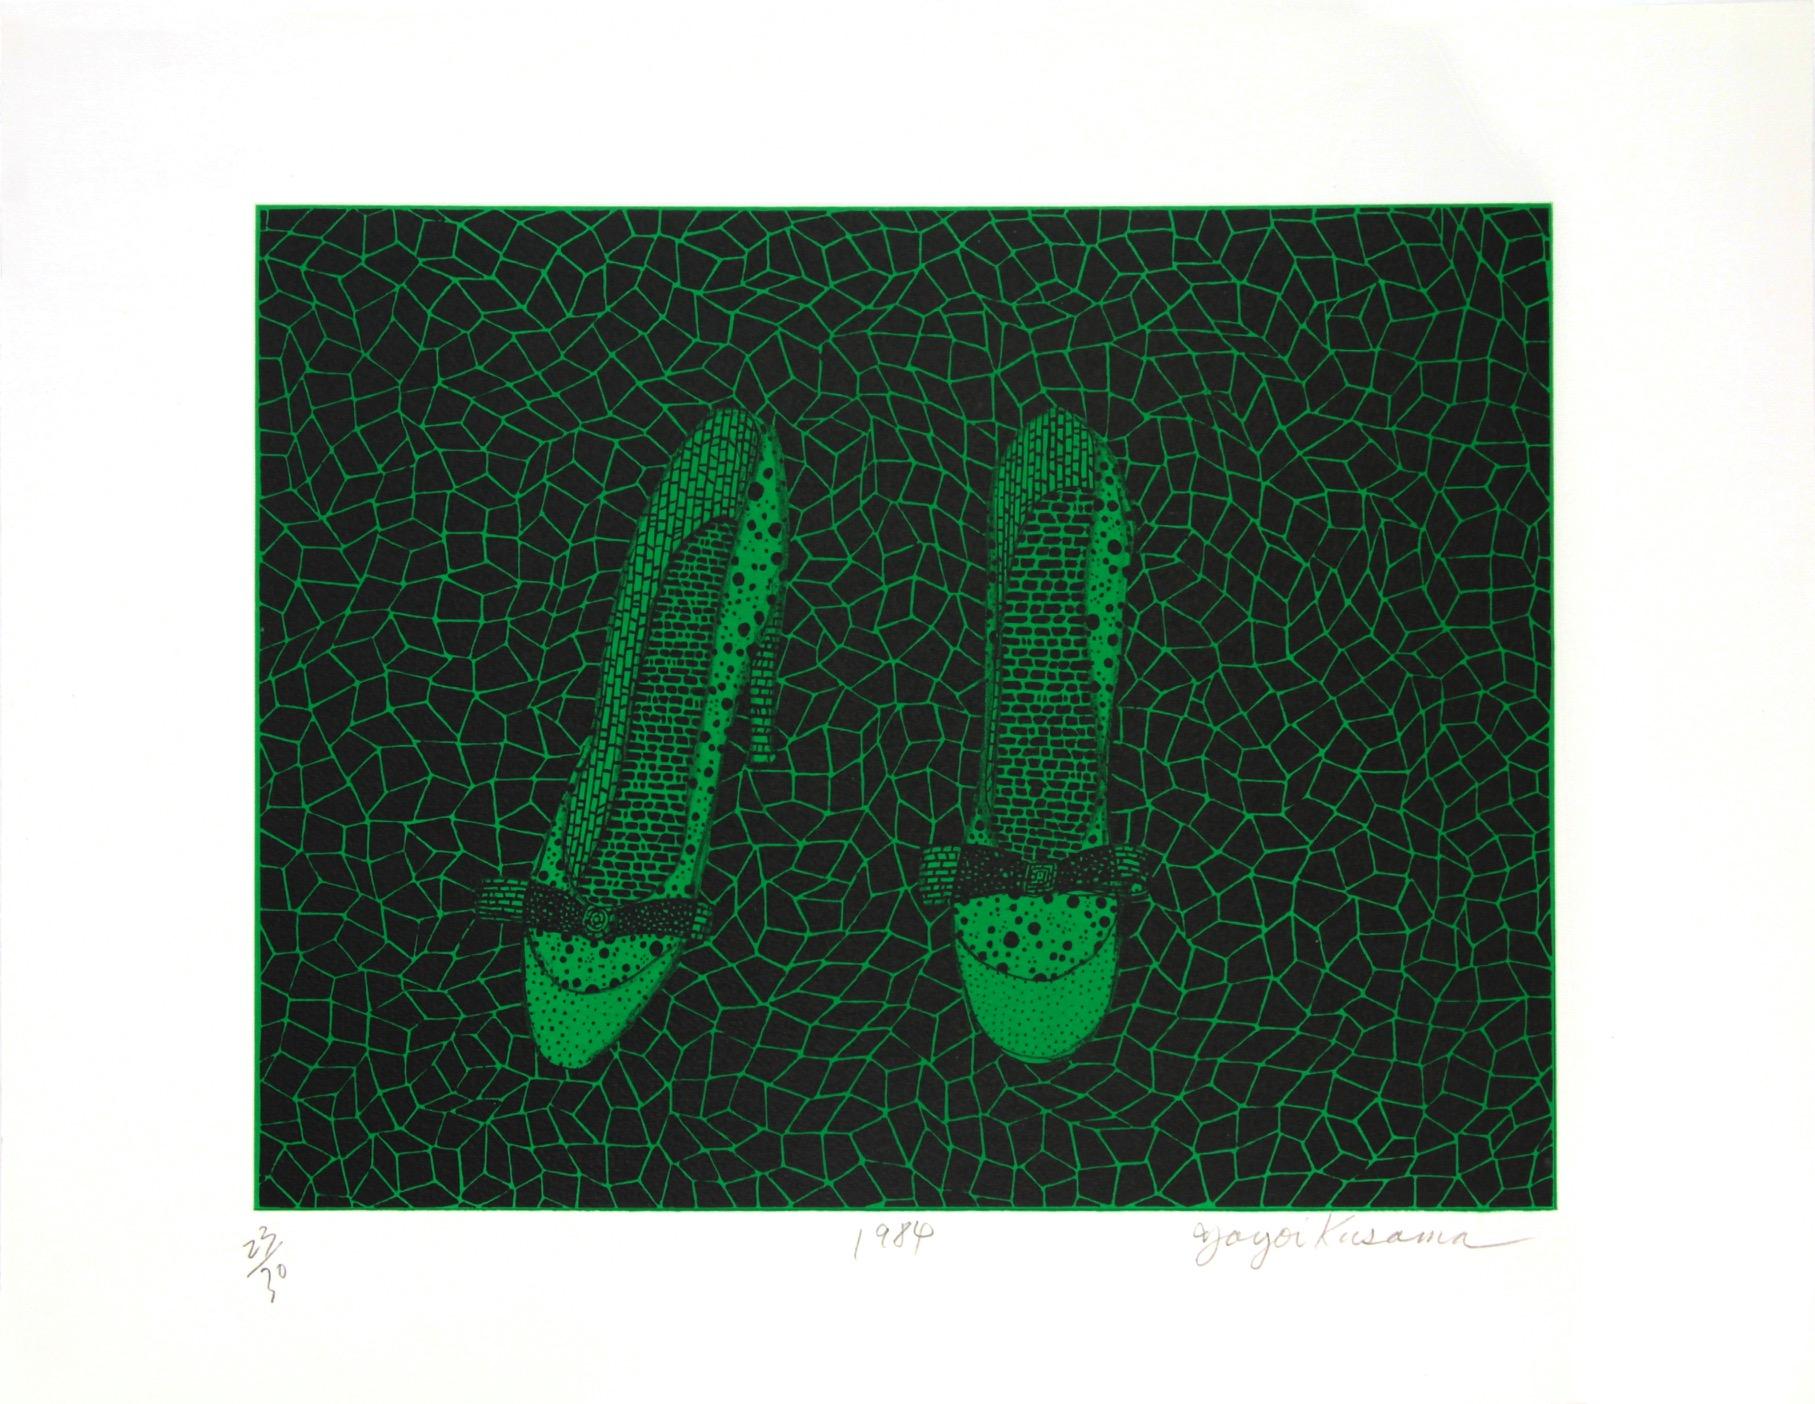 Yayoi_Kusama-Shoes_[Green]-P-YK-005